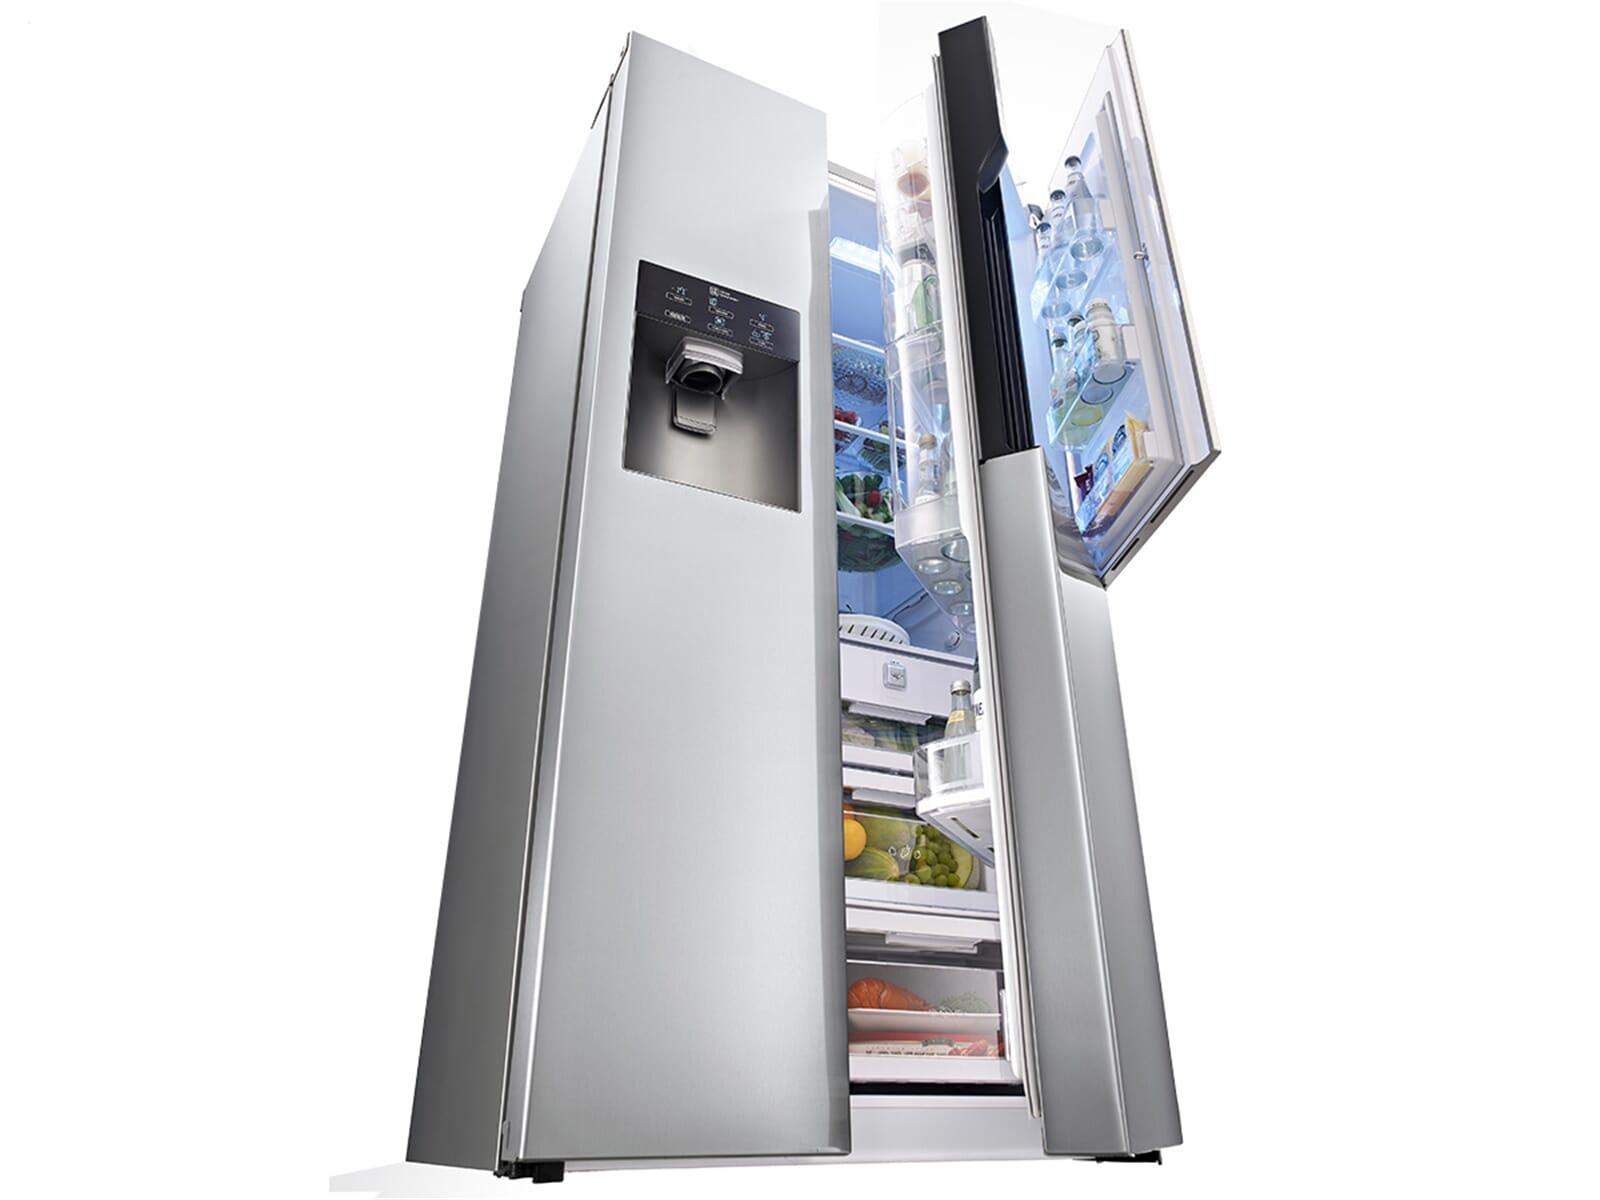 Kühlschrank Kfz : Bester kühlschrank home and living von gorenje bei i love tec de